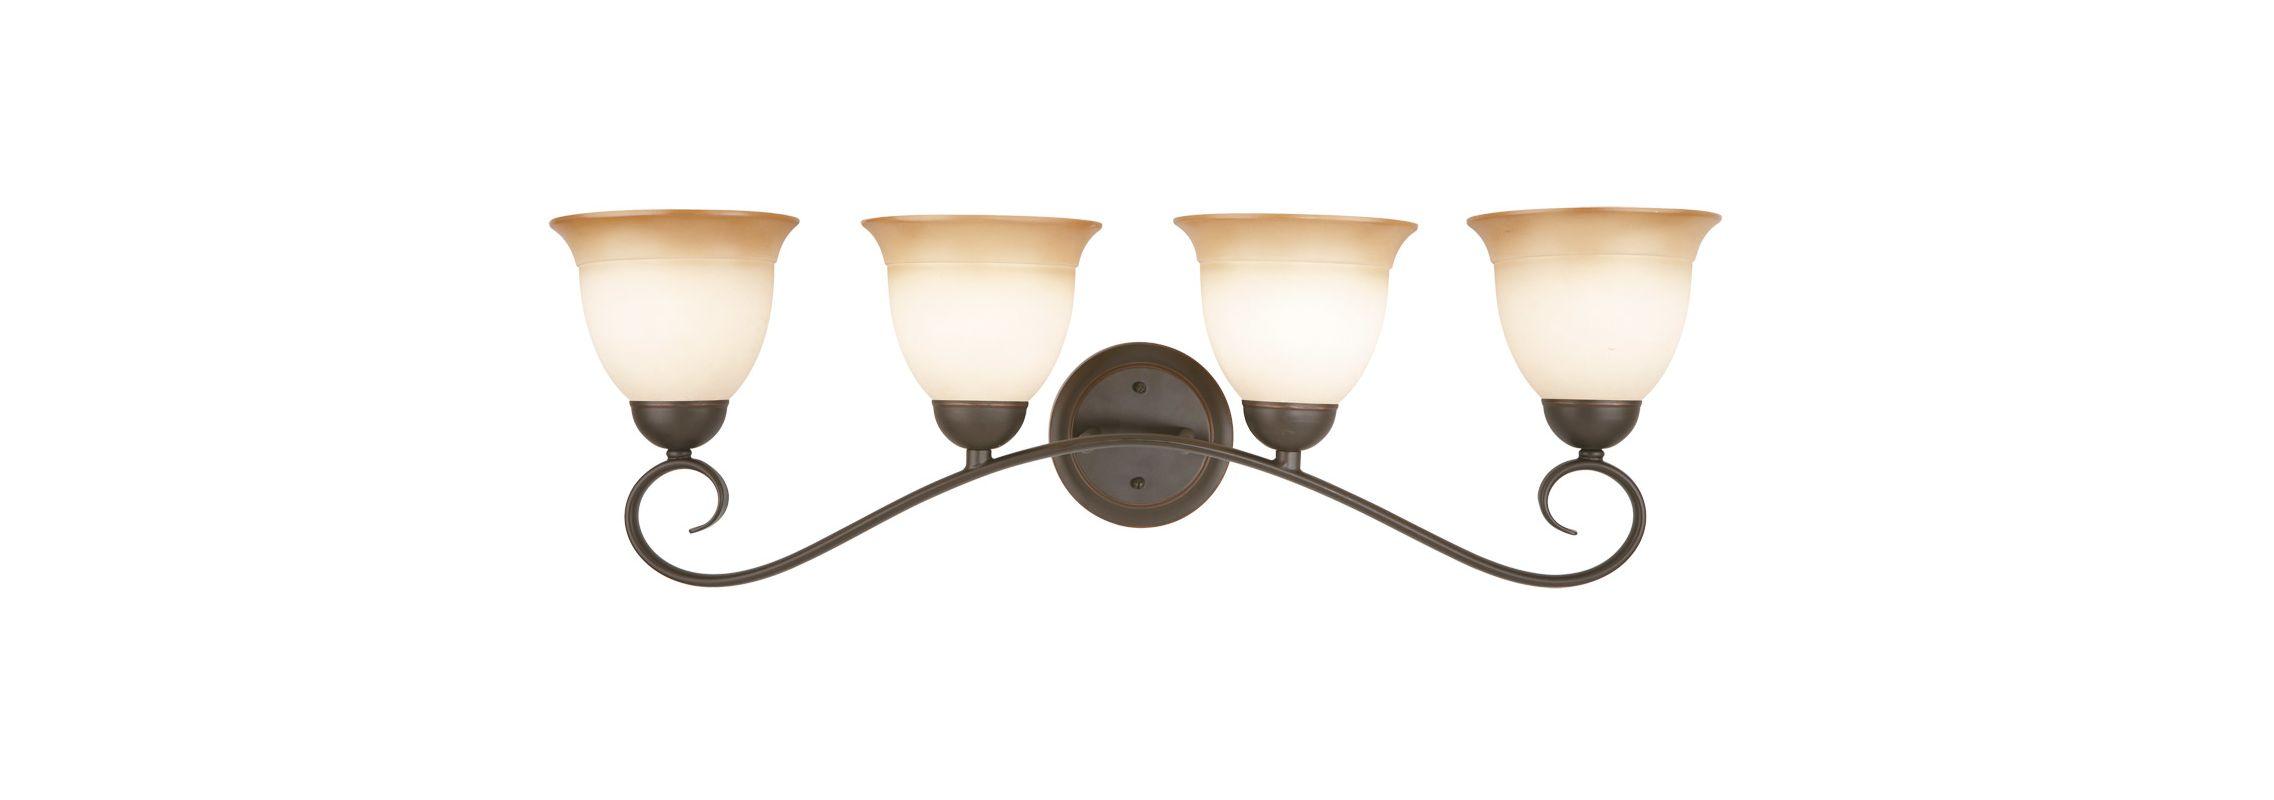 Design House 512673 Cameron Traditional / Classic 4 Light Up Lighting